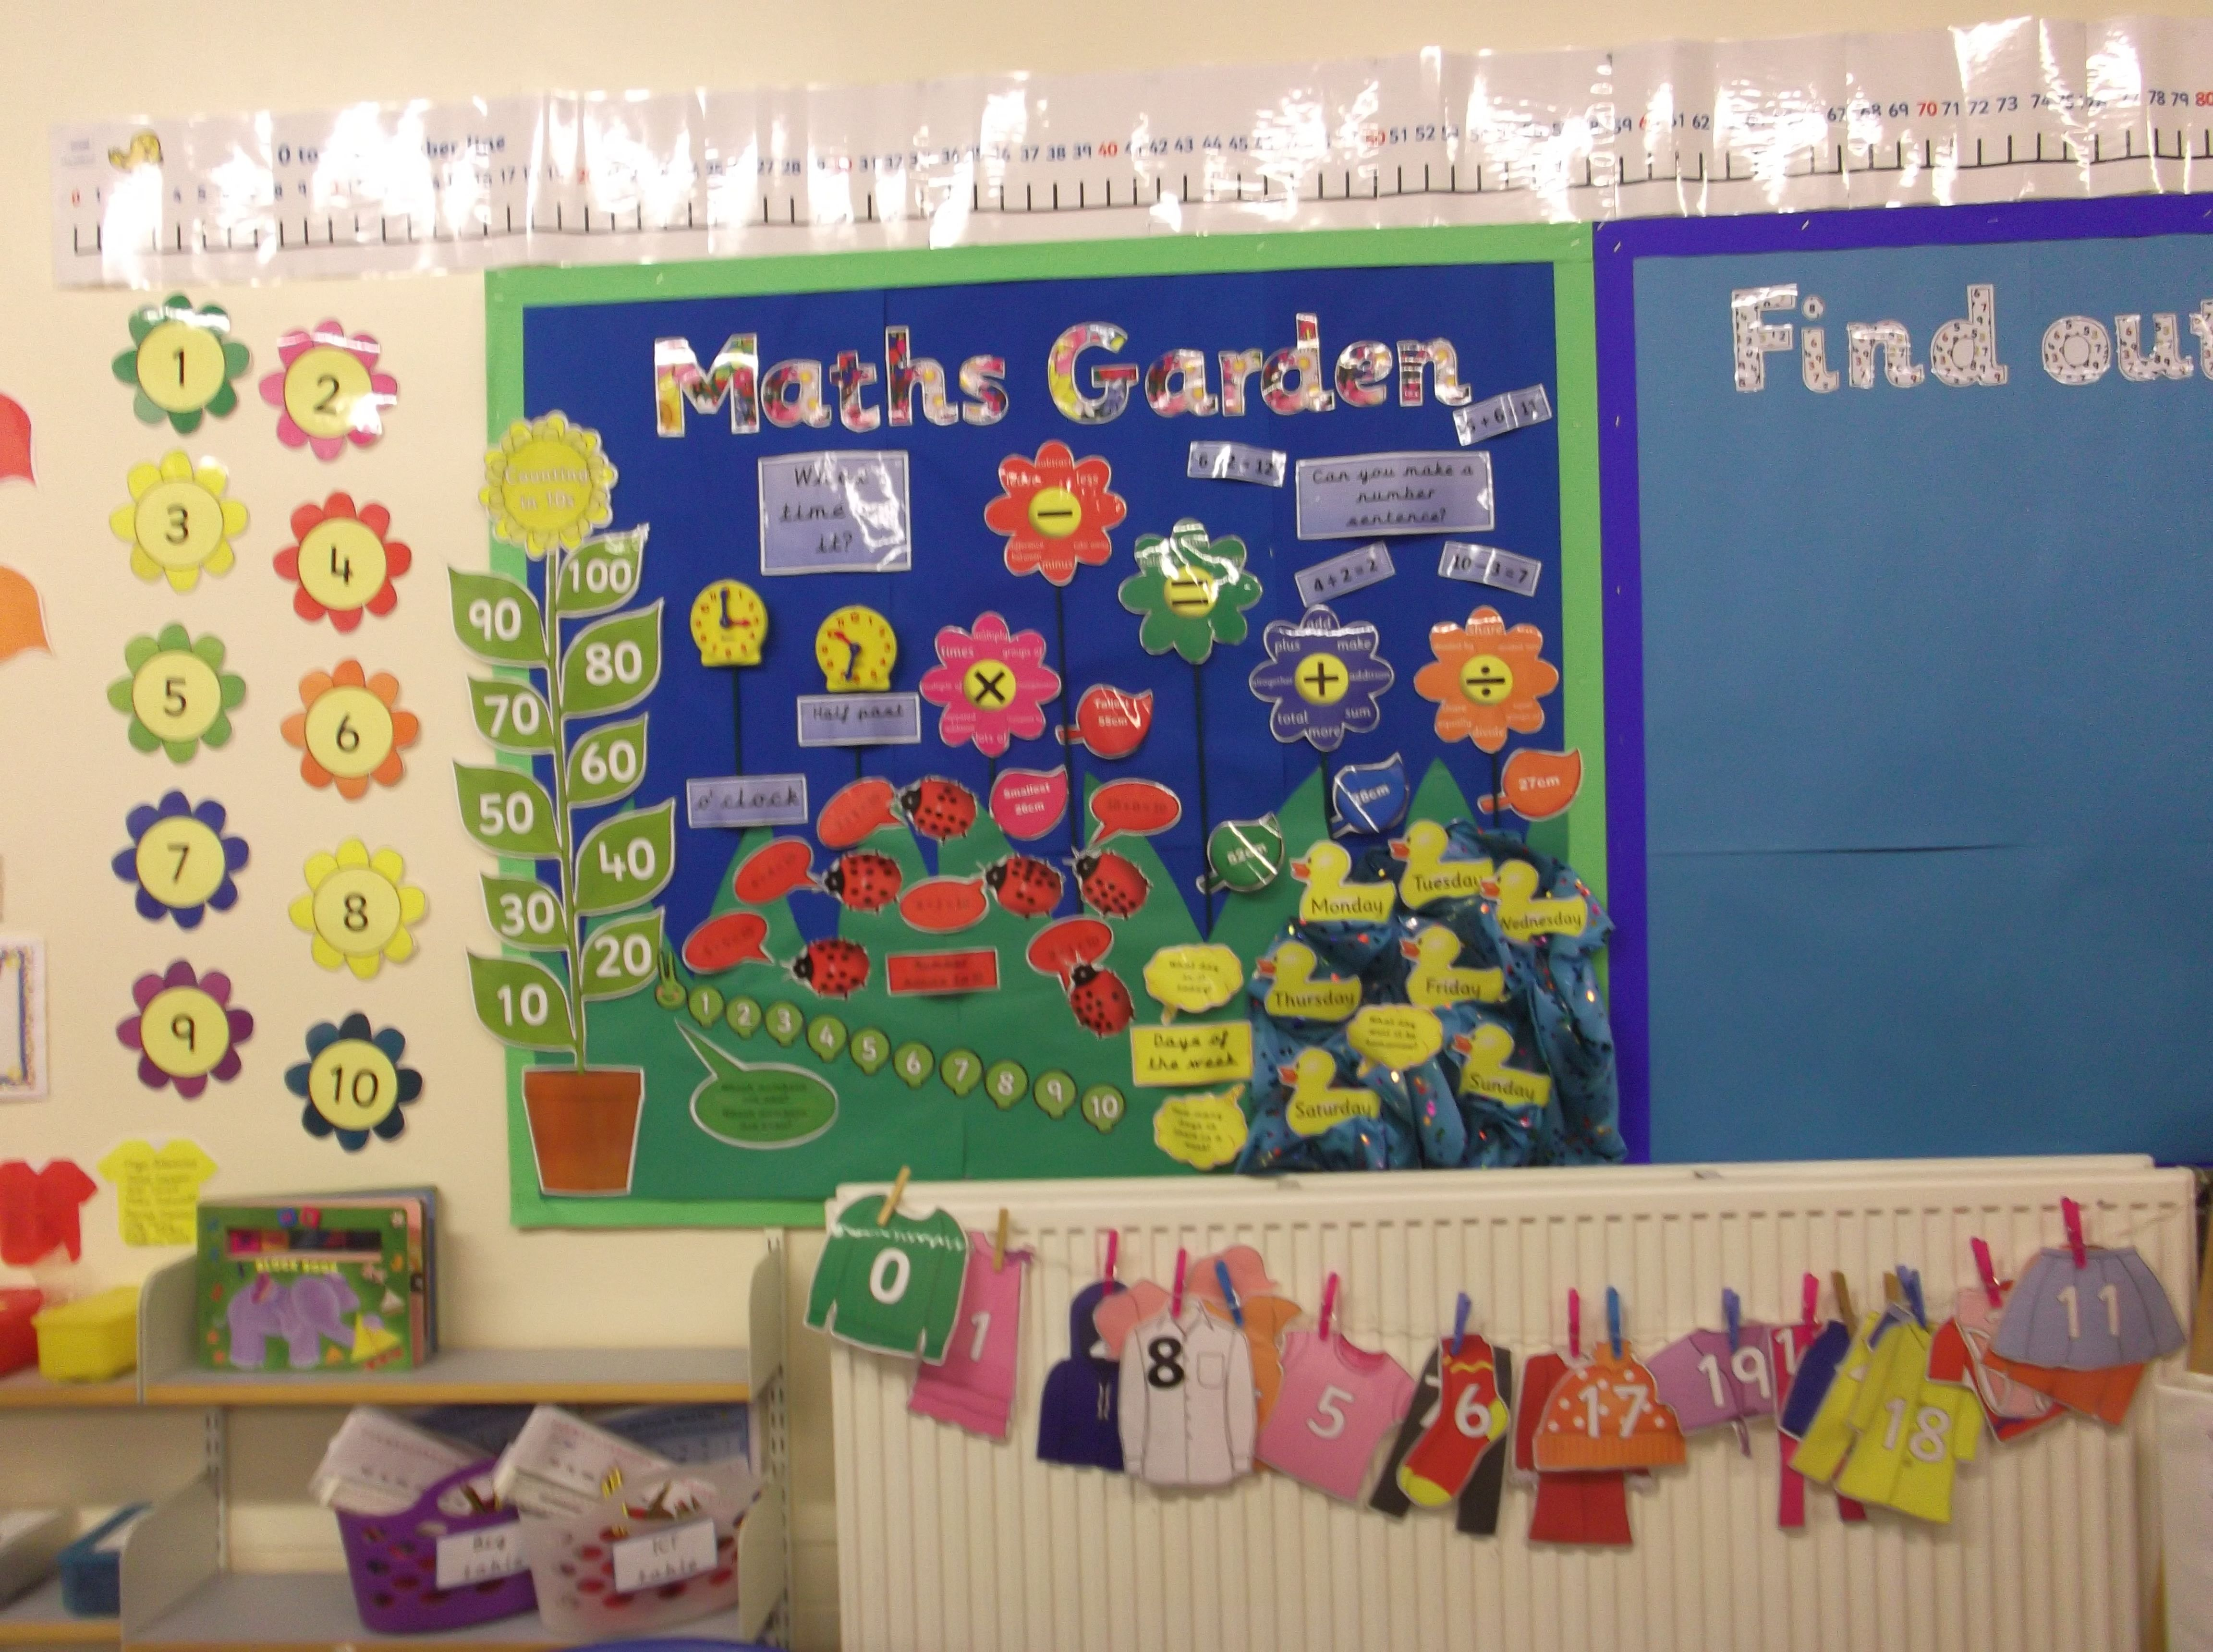 Maths garden display classroom displays pinterest for Garden display ideas